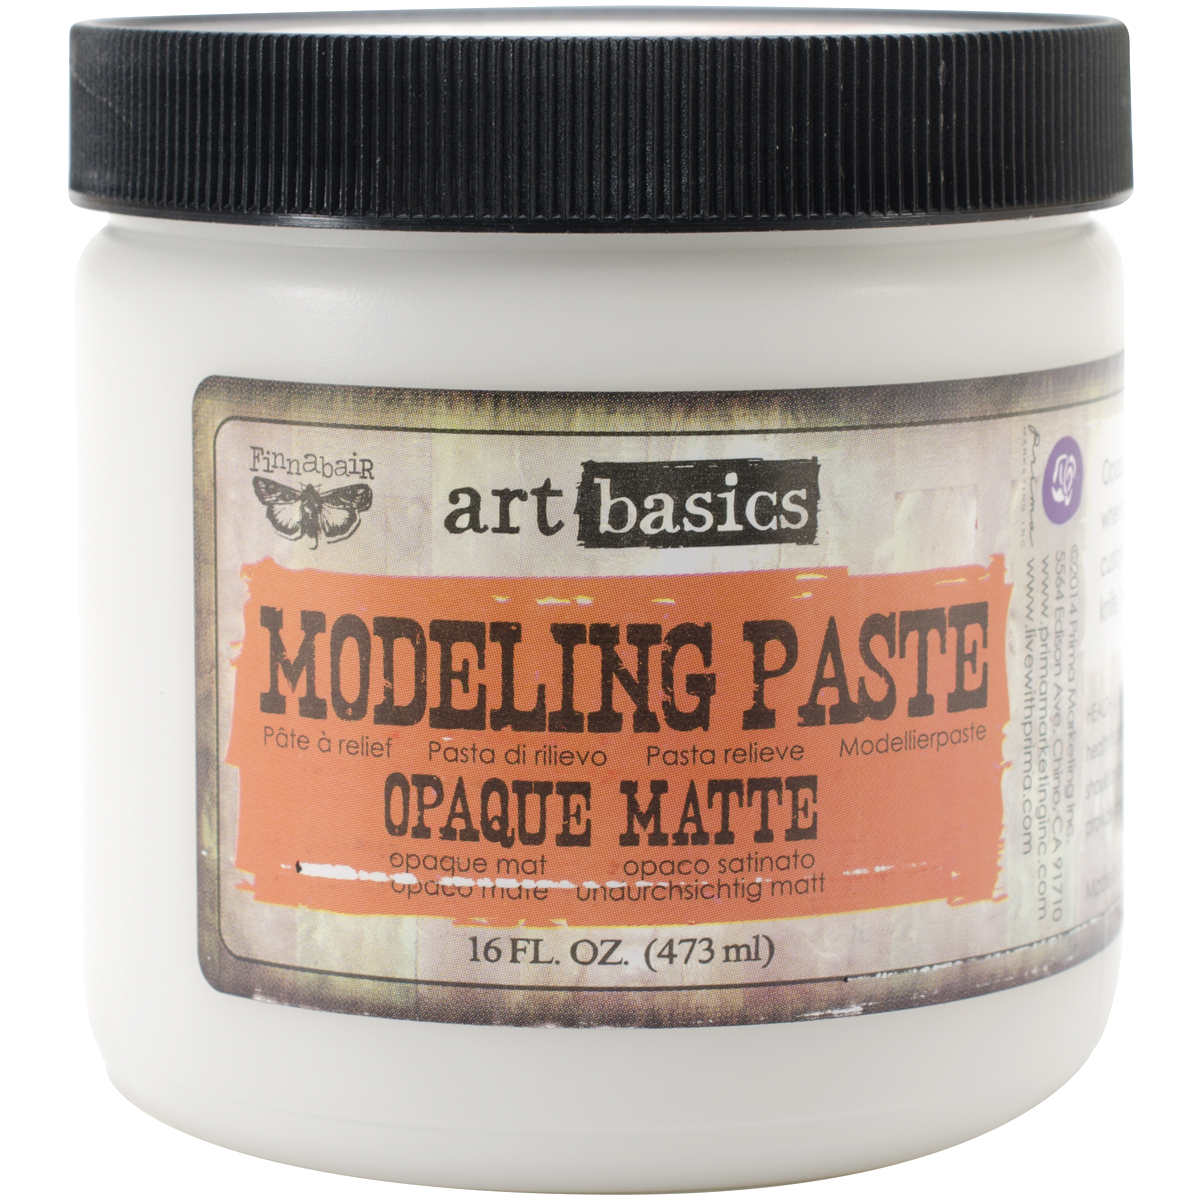 Finnabair Art Basics Modeling Paste 16oz-Opaque Matte